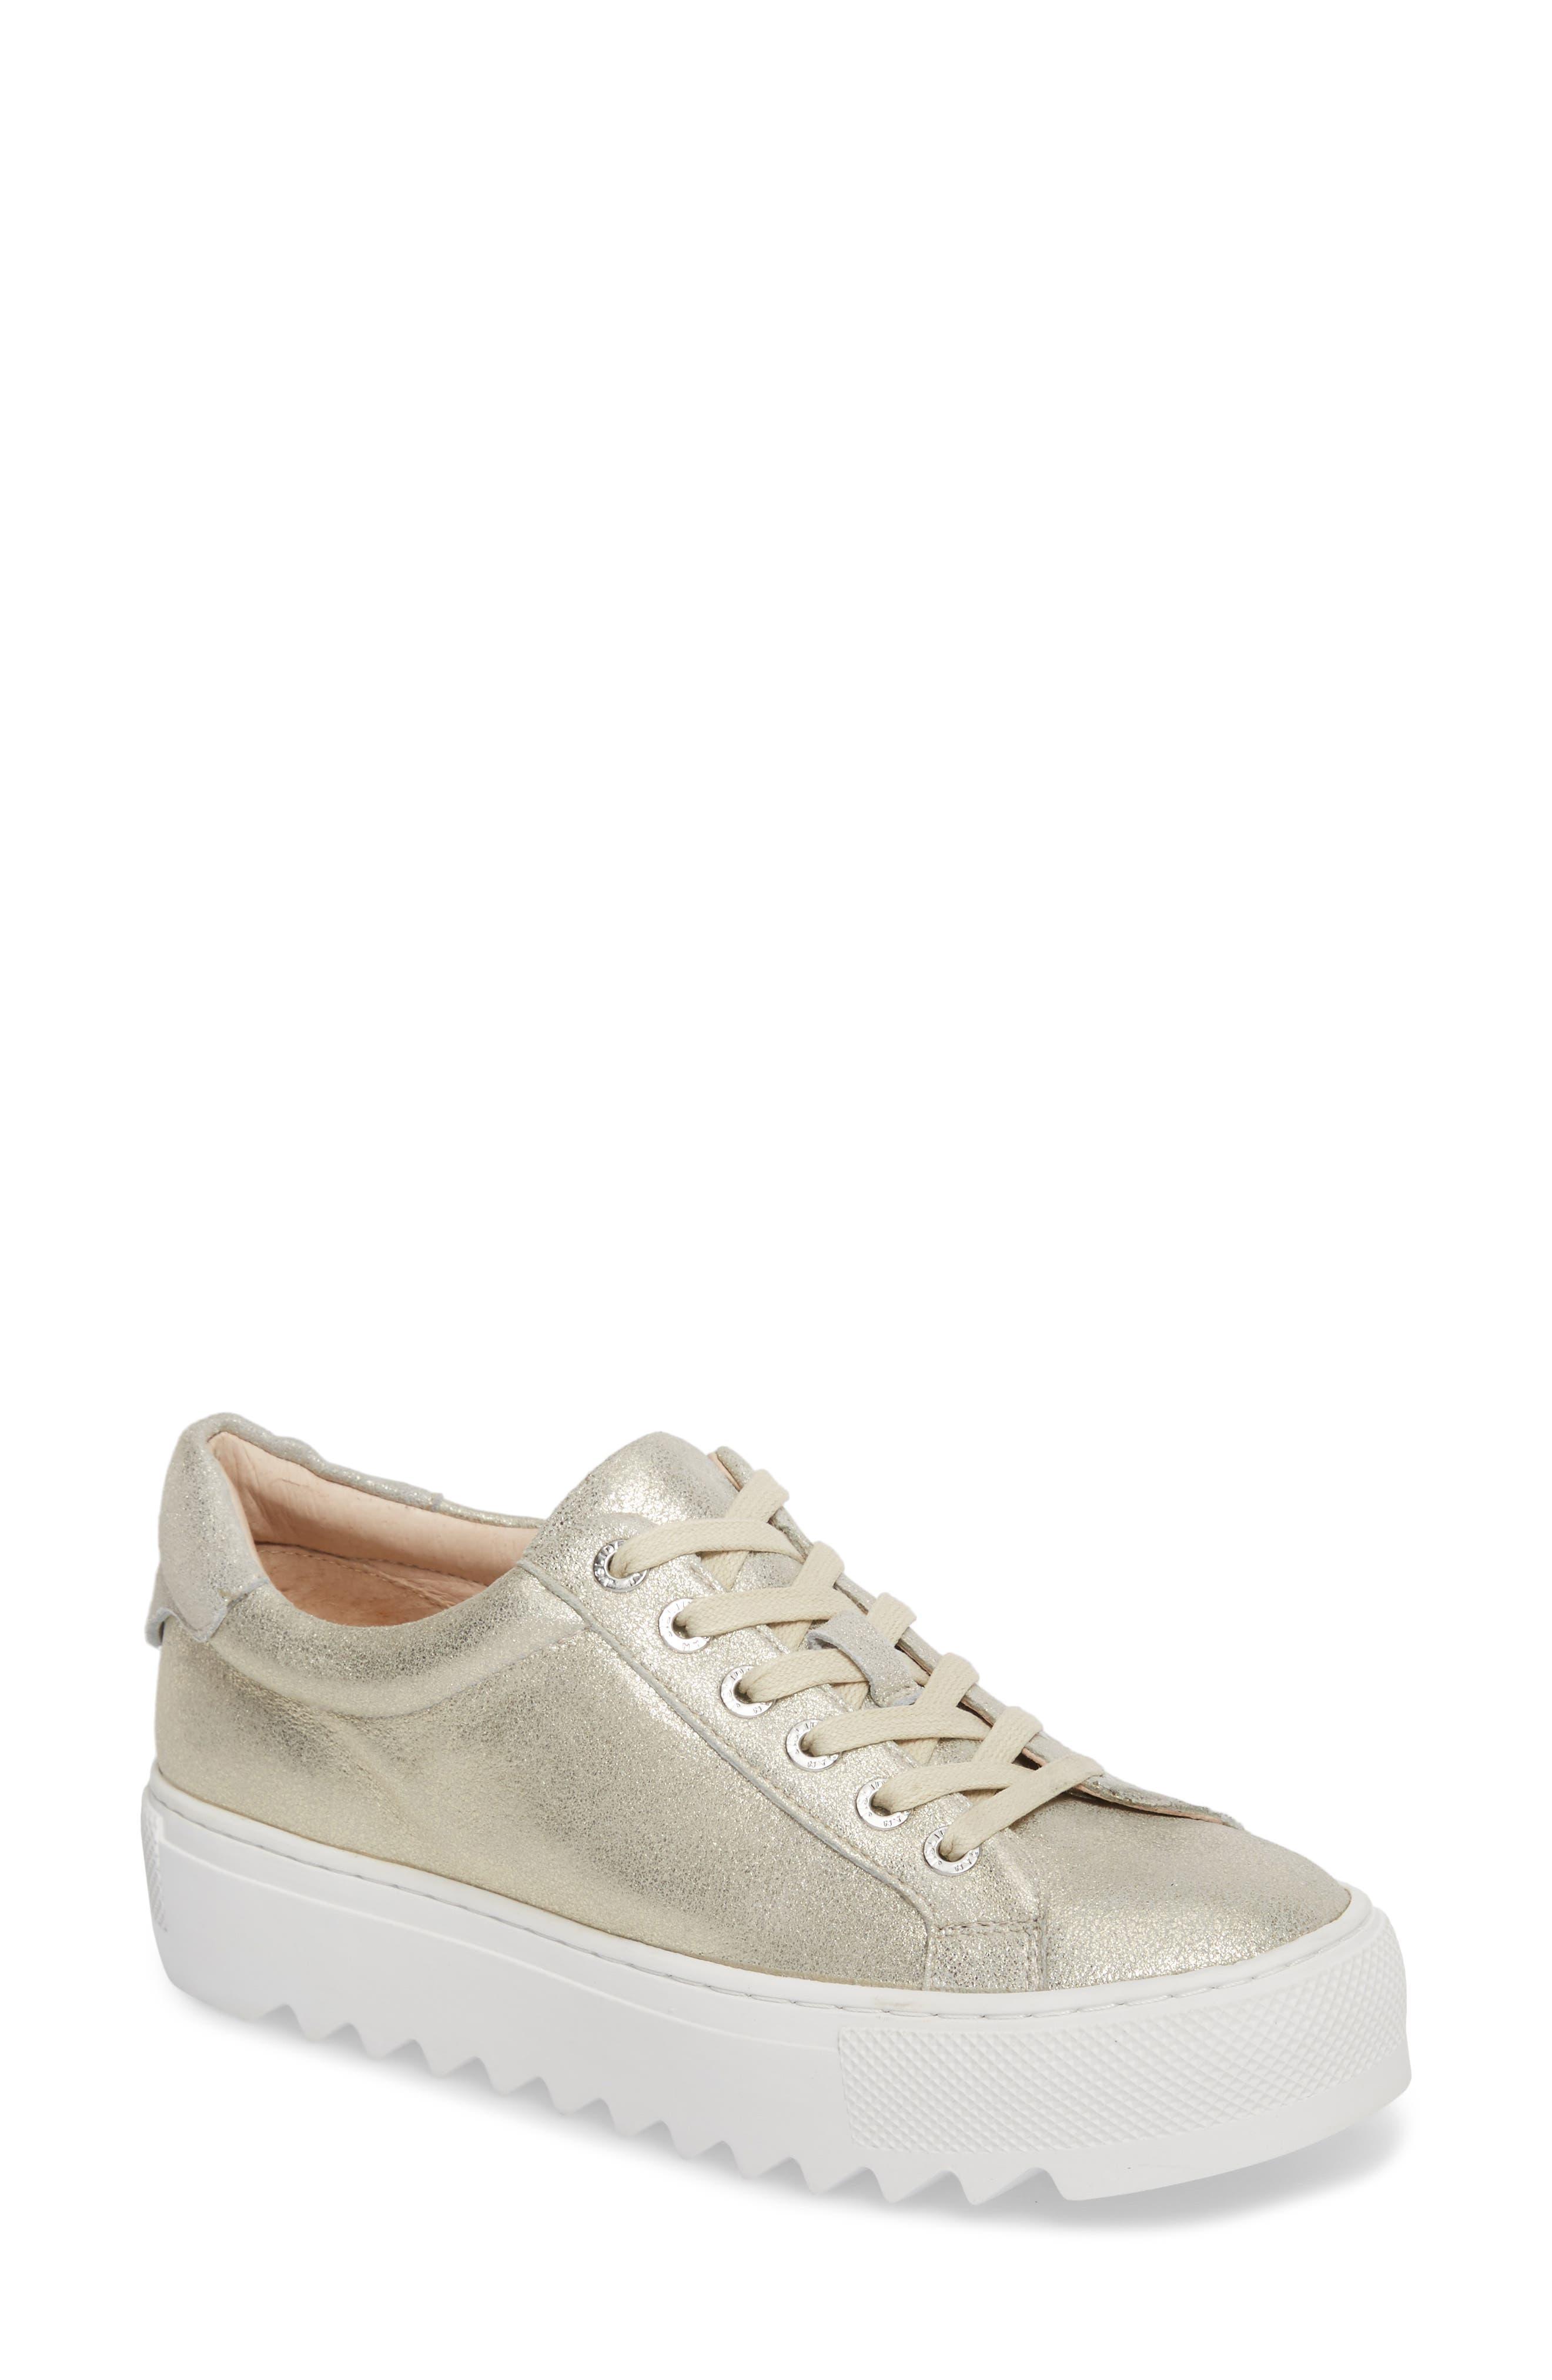 Main Image - JSlides Sapphire Platform Sneaker (Women)